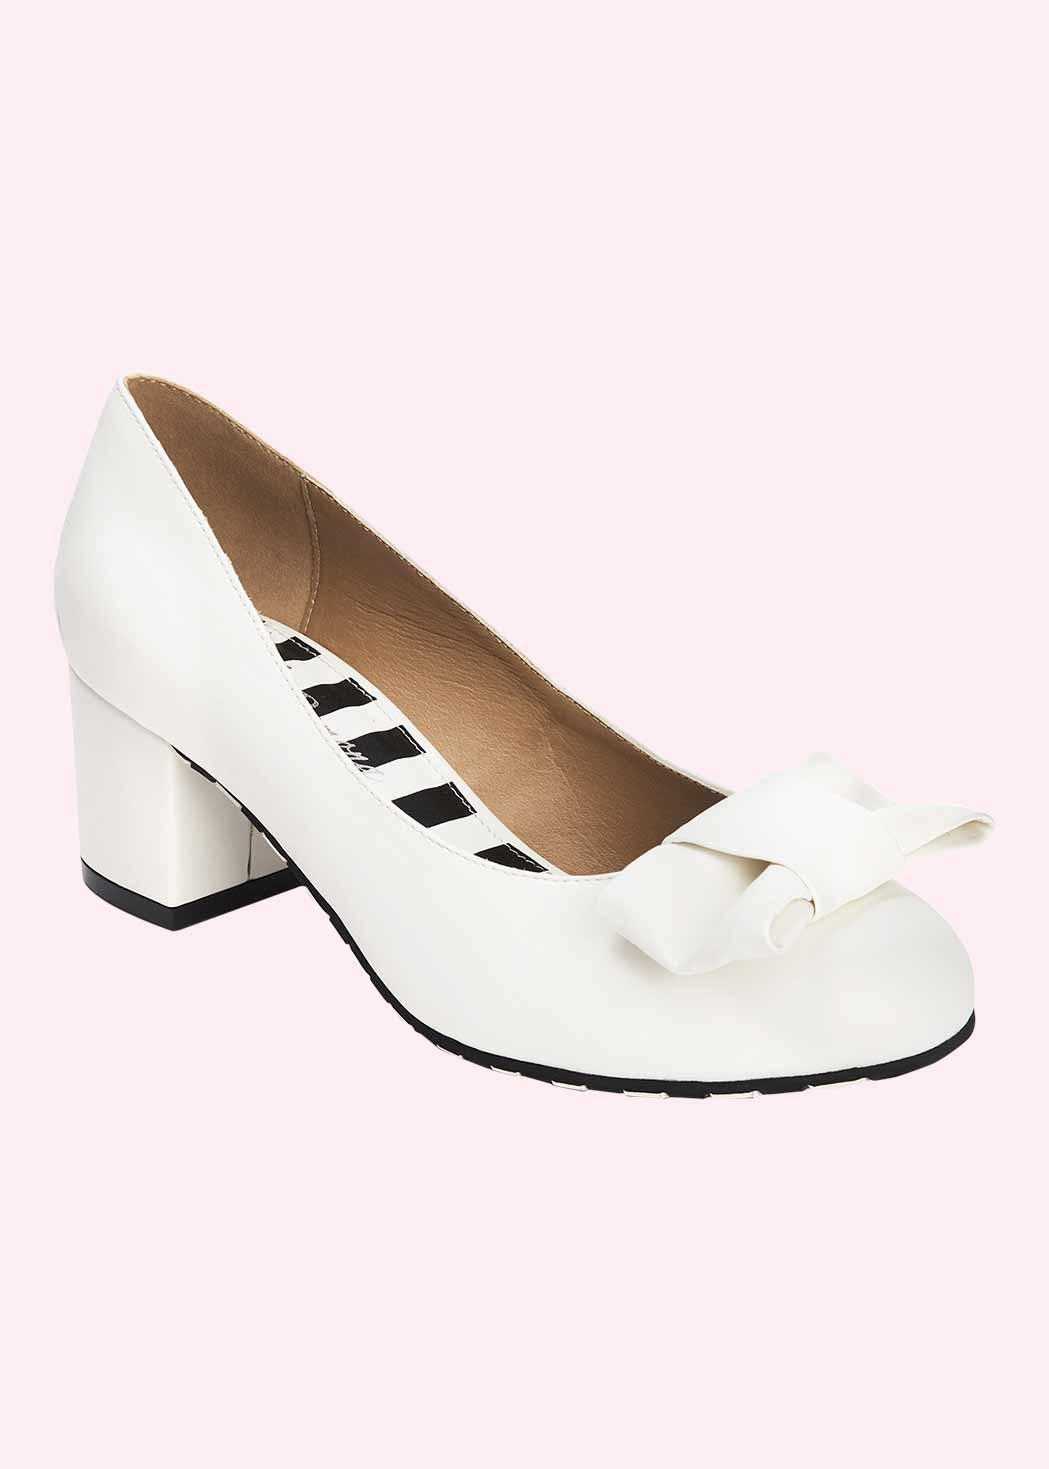 60'er sko i hvid med sløjfe fra Lola Ramona